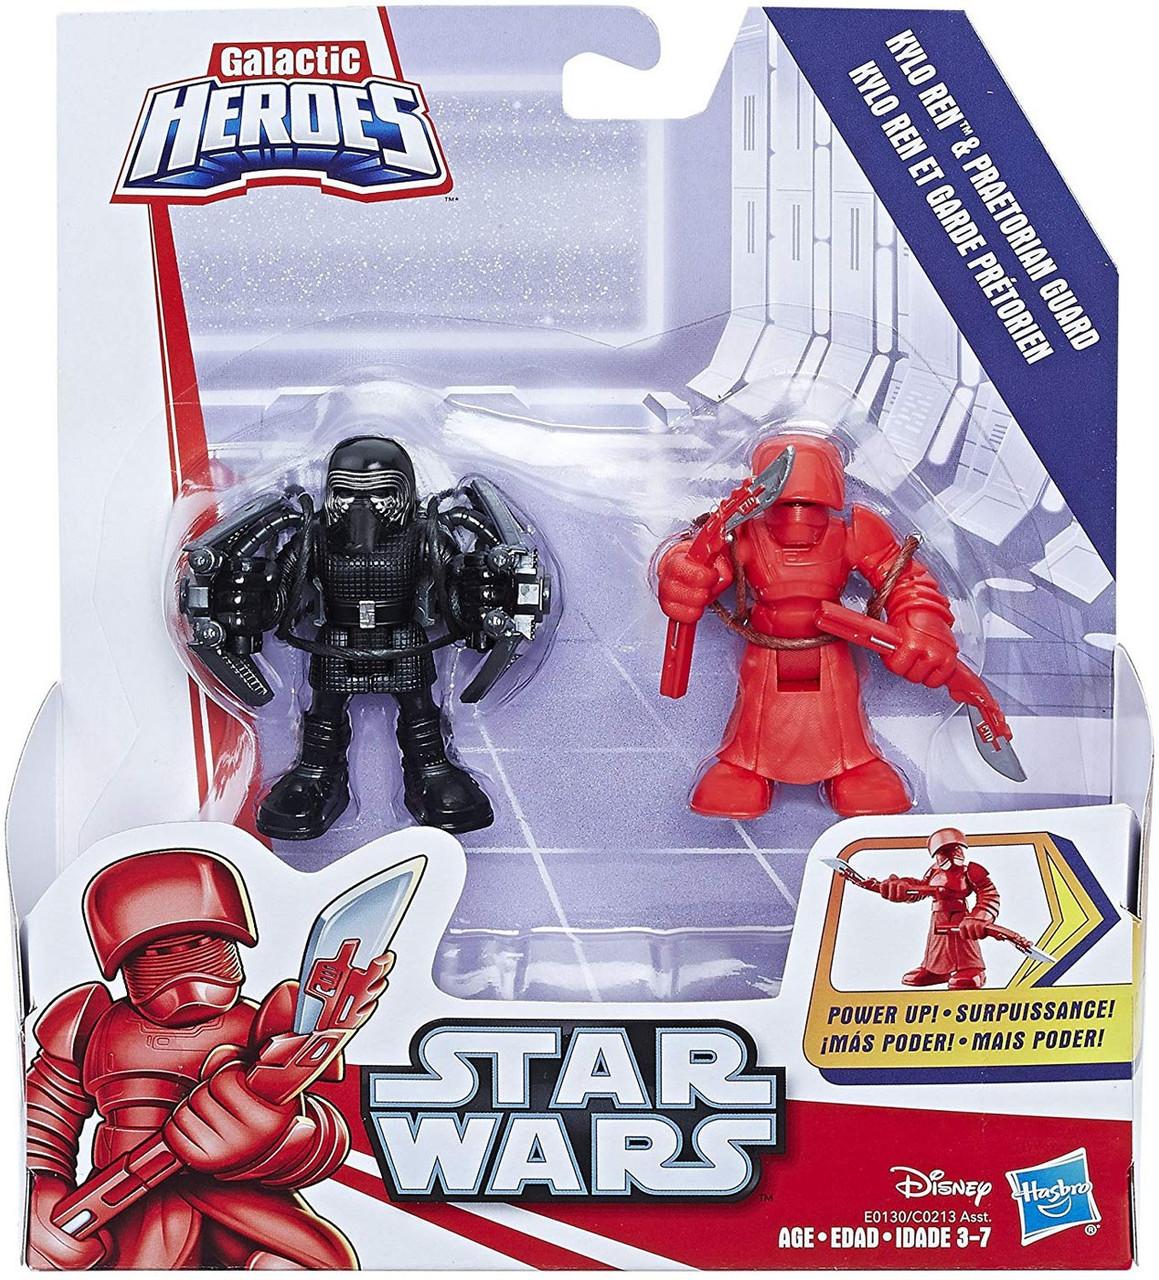 Star WarsThe Force AwakensElite SquadKylo Ren Wallet /& Backpack Set